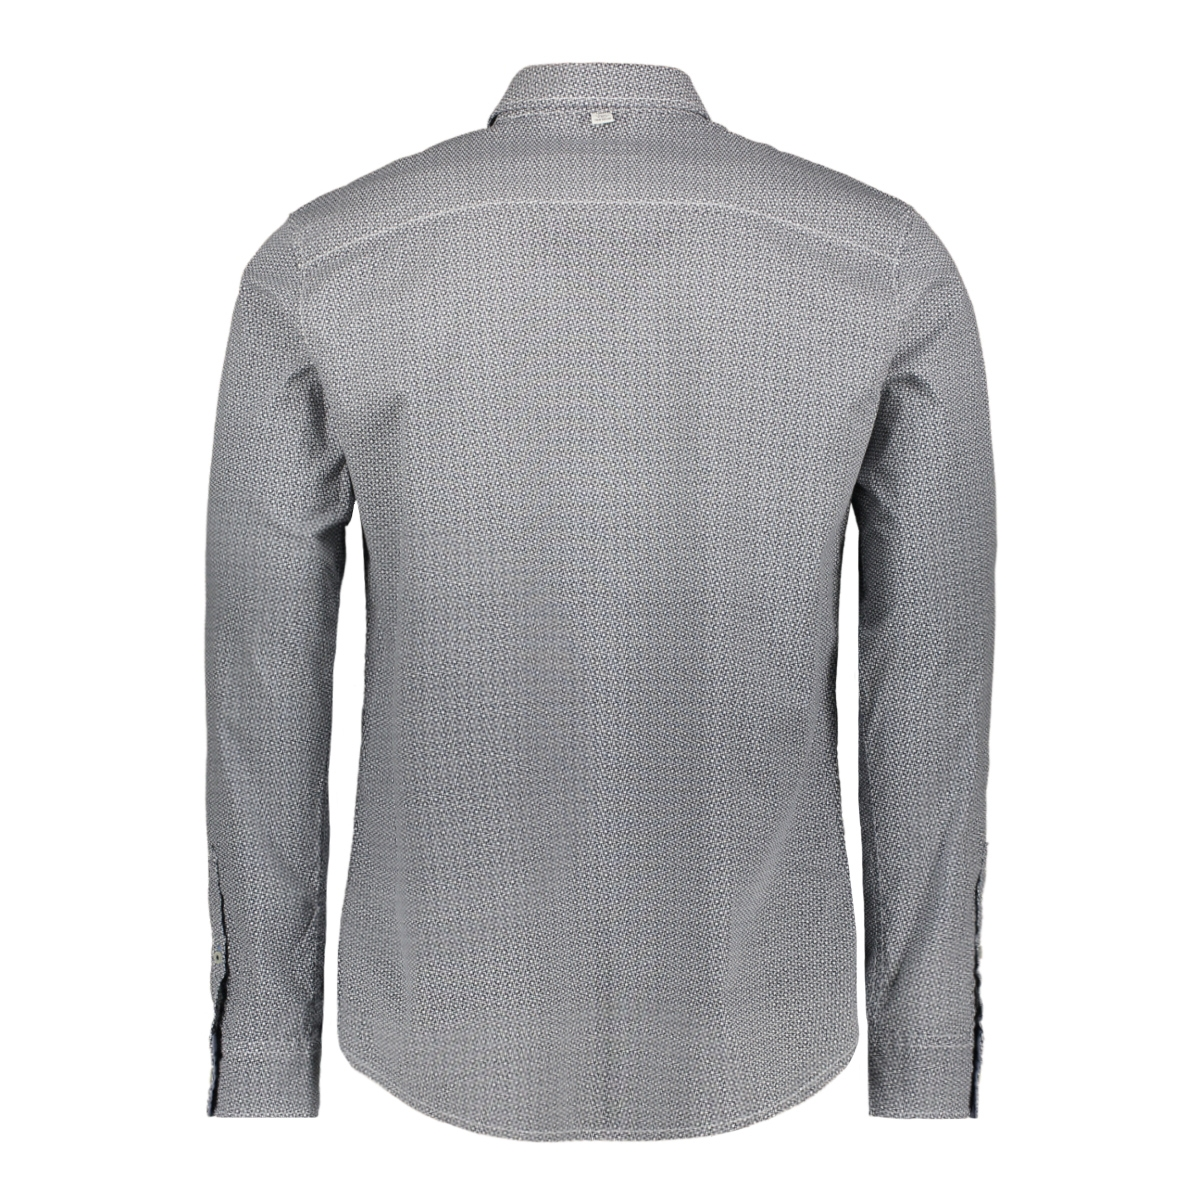 overhemd met print 1020645xx10 tom tailor overhemd 22280